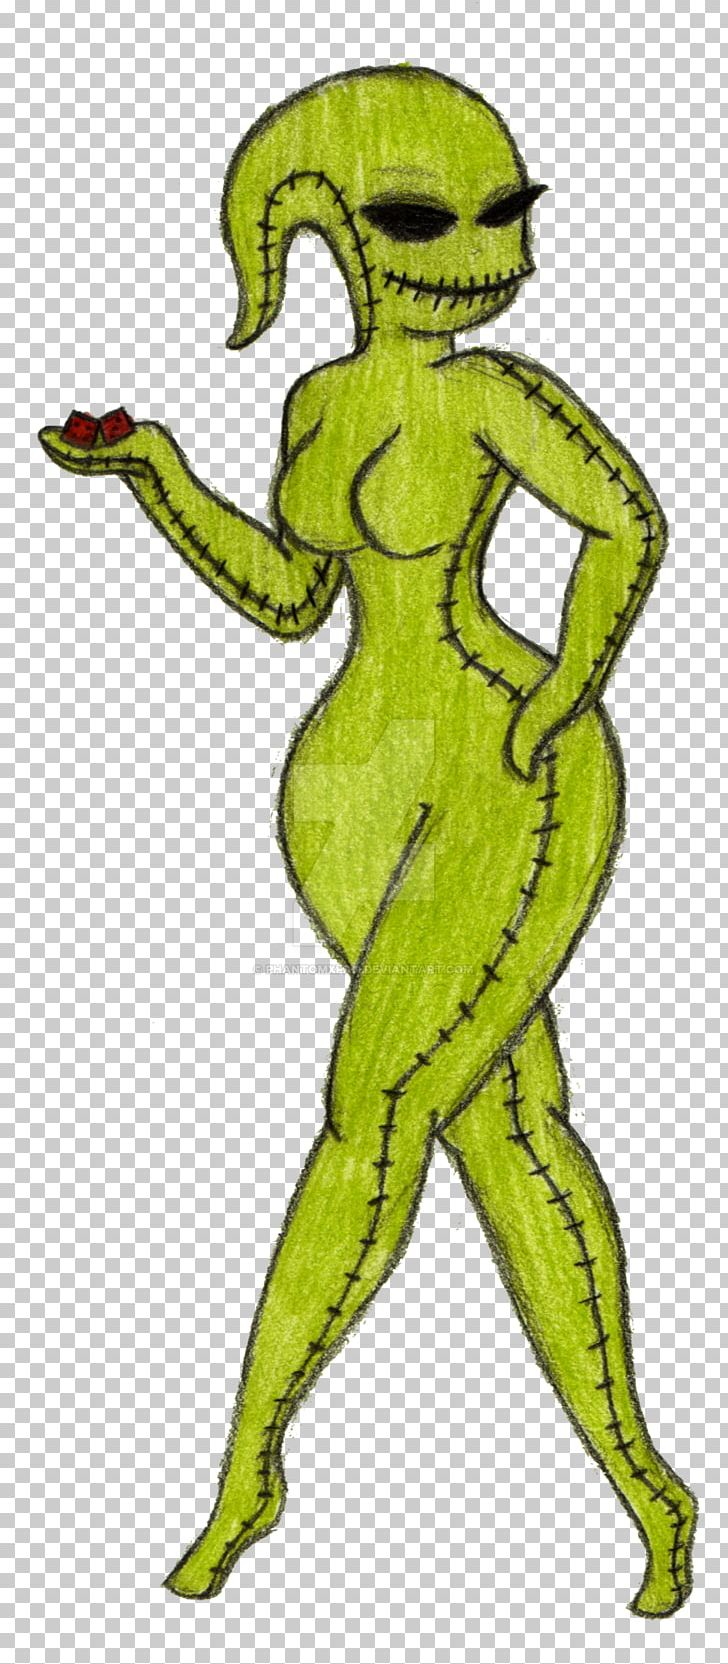 Oogie Boogie Boogeyman Drawing PNG, Clipart, Art, Boogeyman, Boogie, Cartoon, Costume Design Free PNG Download